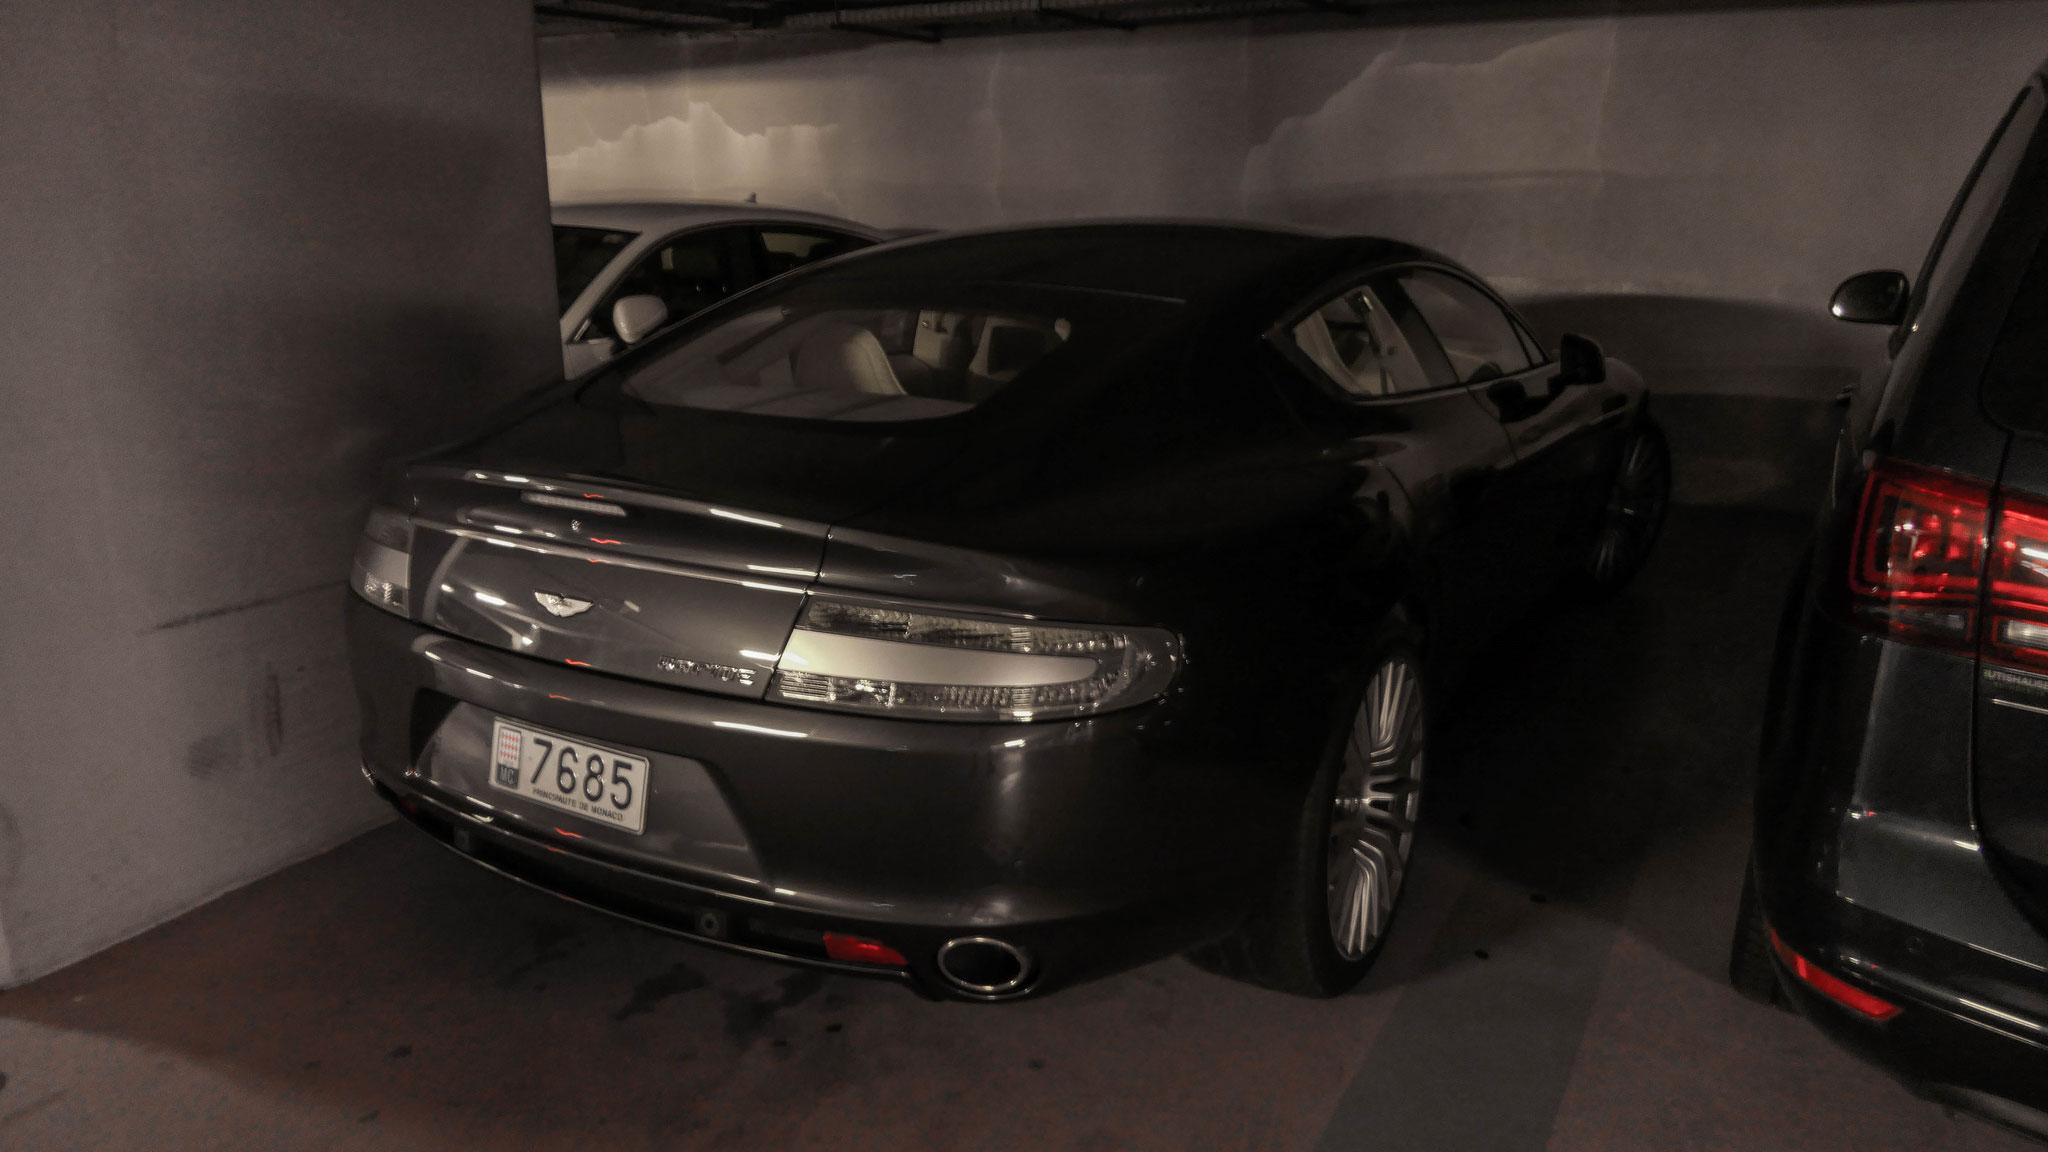 Aston Martin Rapide - 7685 (MC)